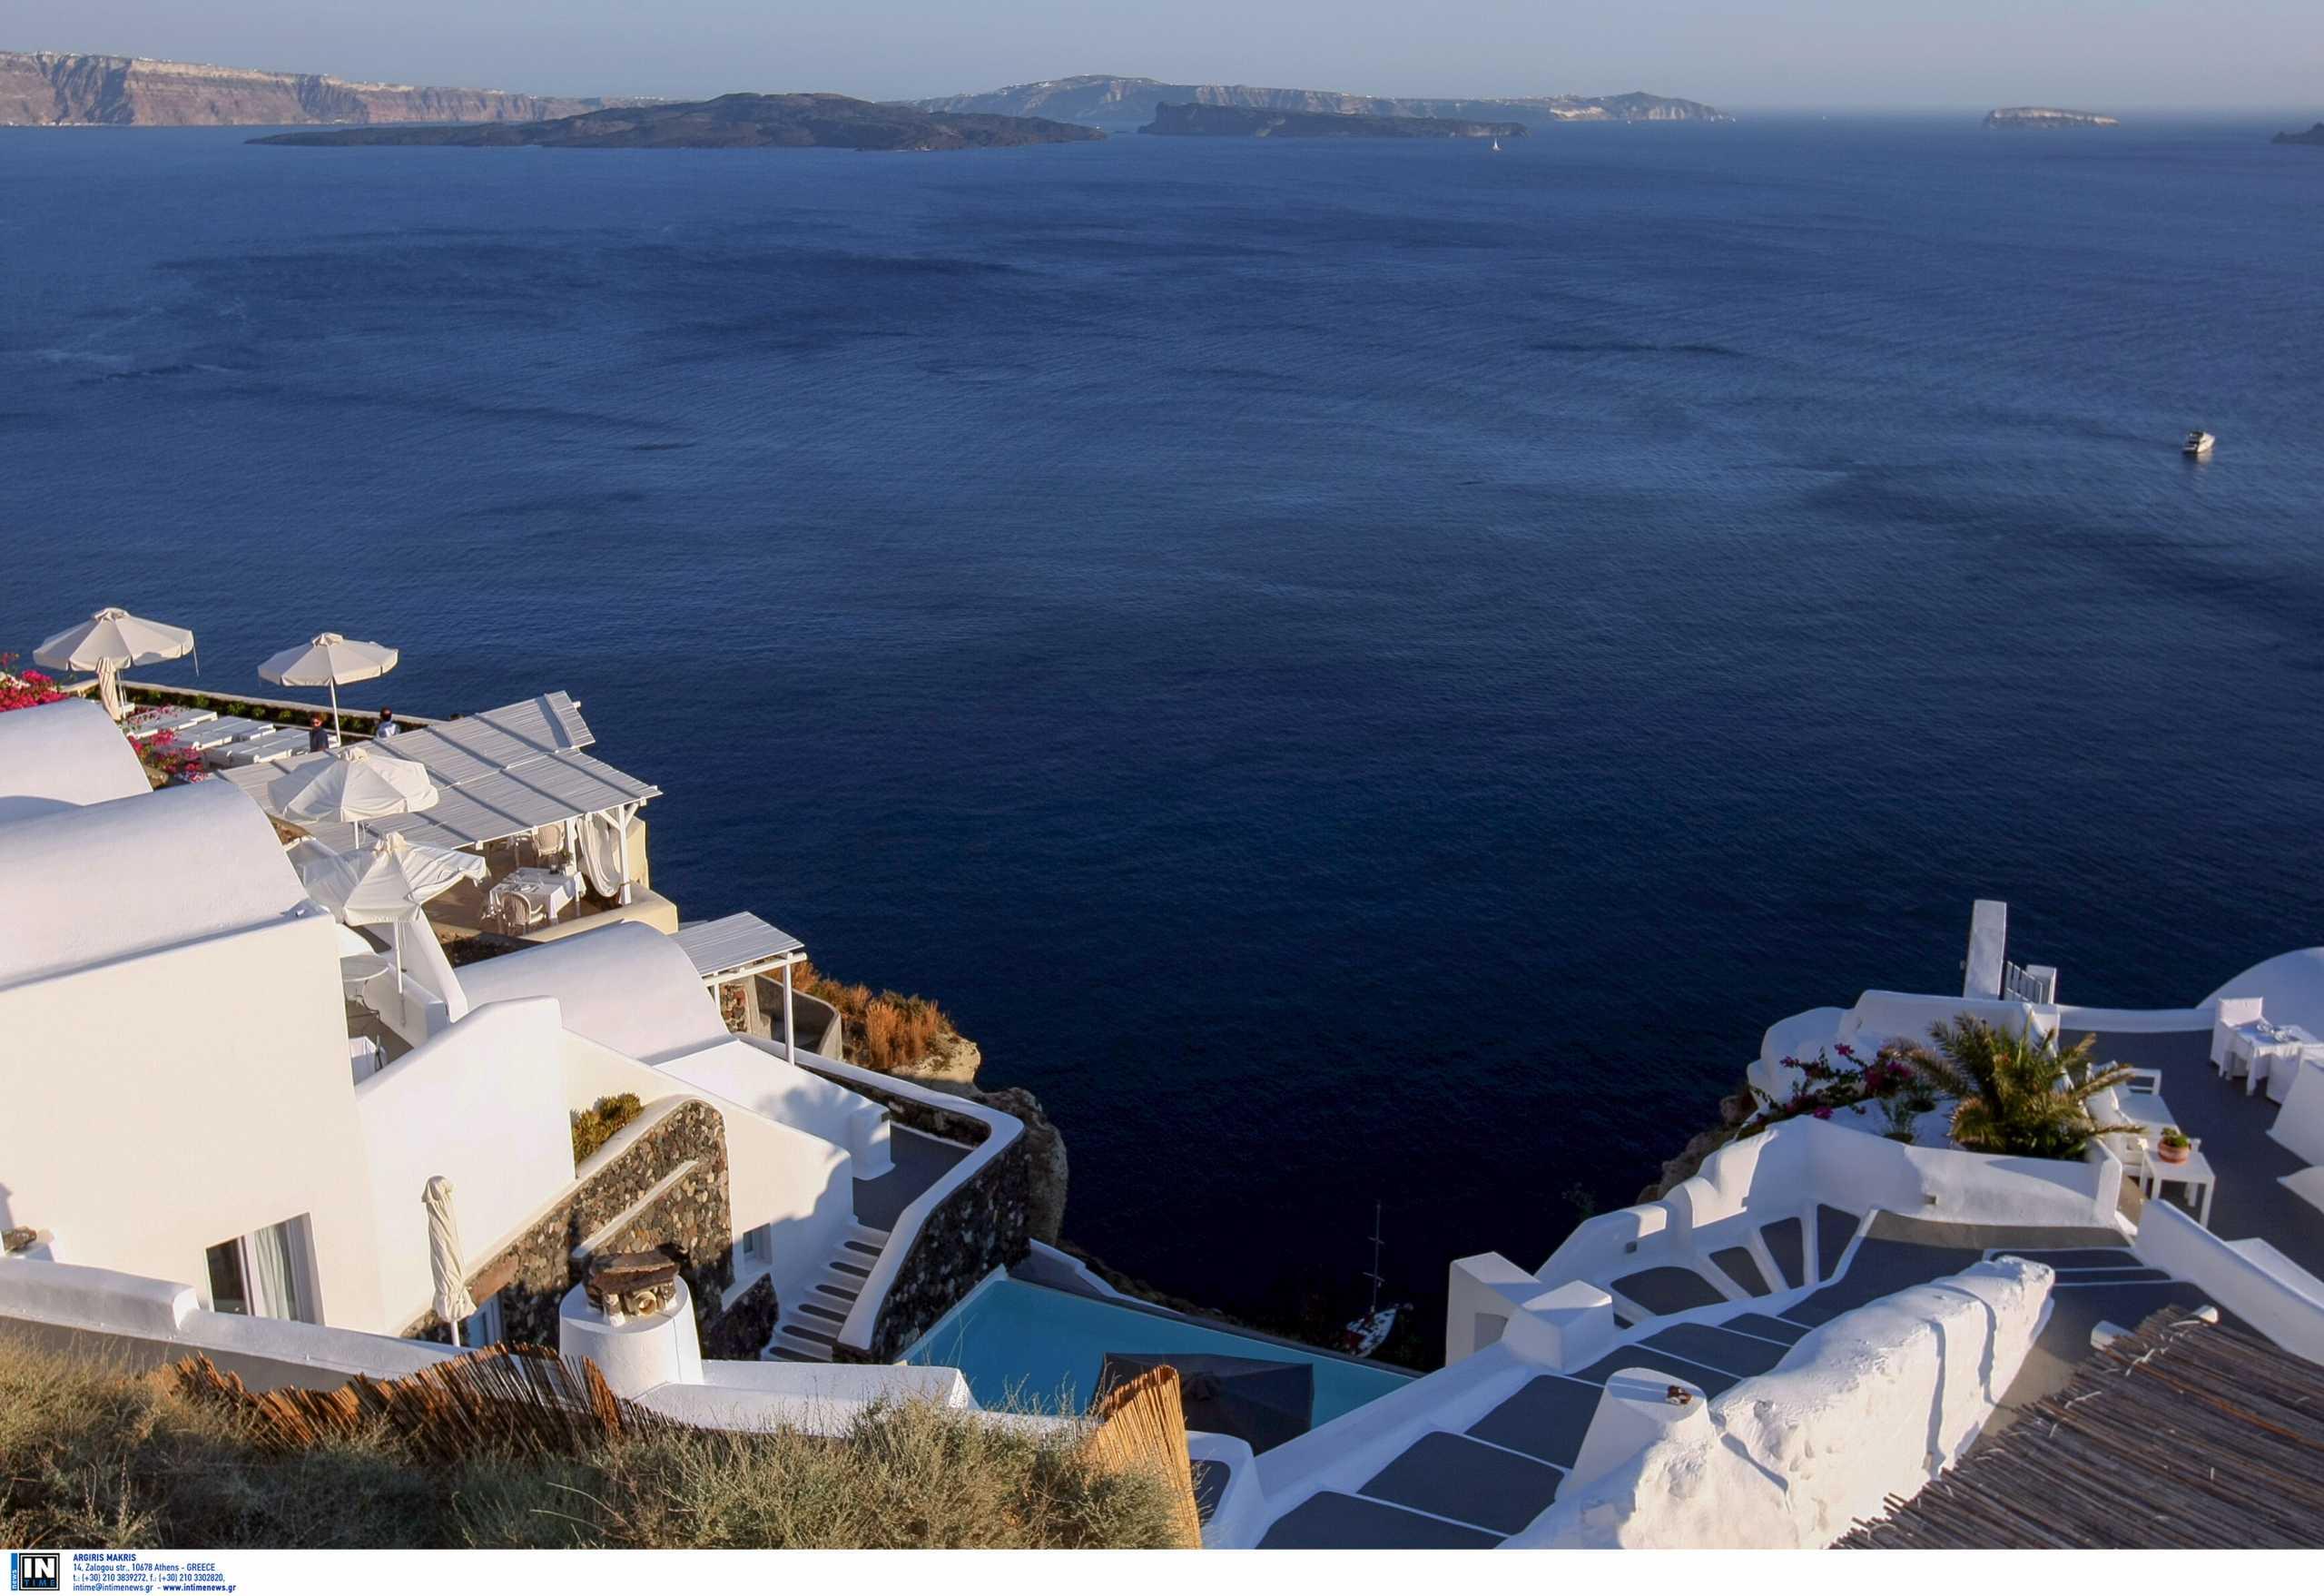 La Repubblica: Η Ελλάδα εμβολιάζει τους κατοίκους των νησιών με λιγότερους από 5.000 κατοίκους μέχρι τέλη Απριλίου